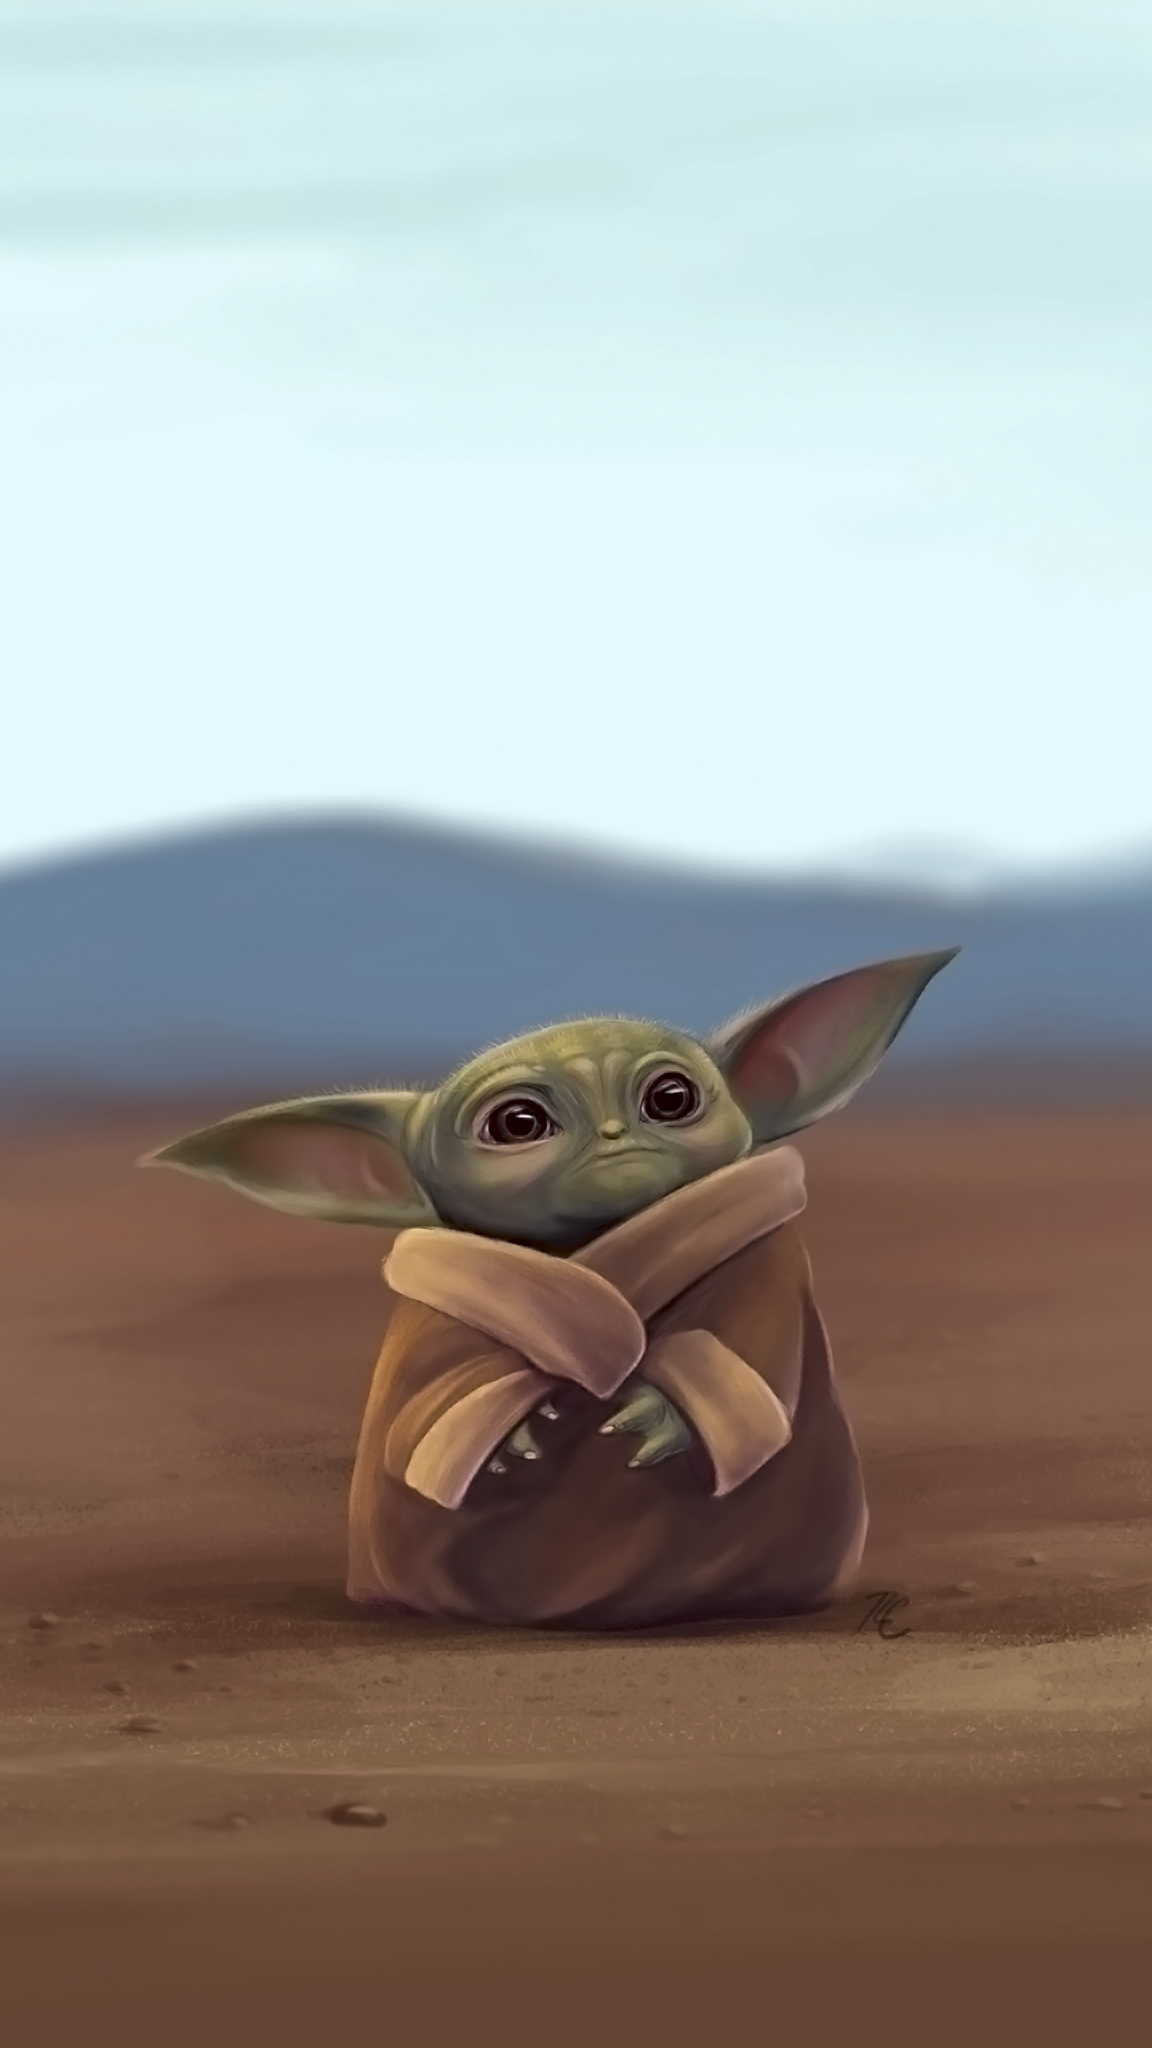 Baby Yoda Phone Wallpapers Top Free Baby Yoda Phone Backgrounds Wallpaperaccess